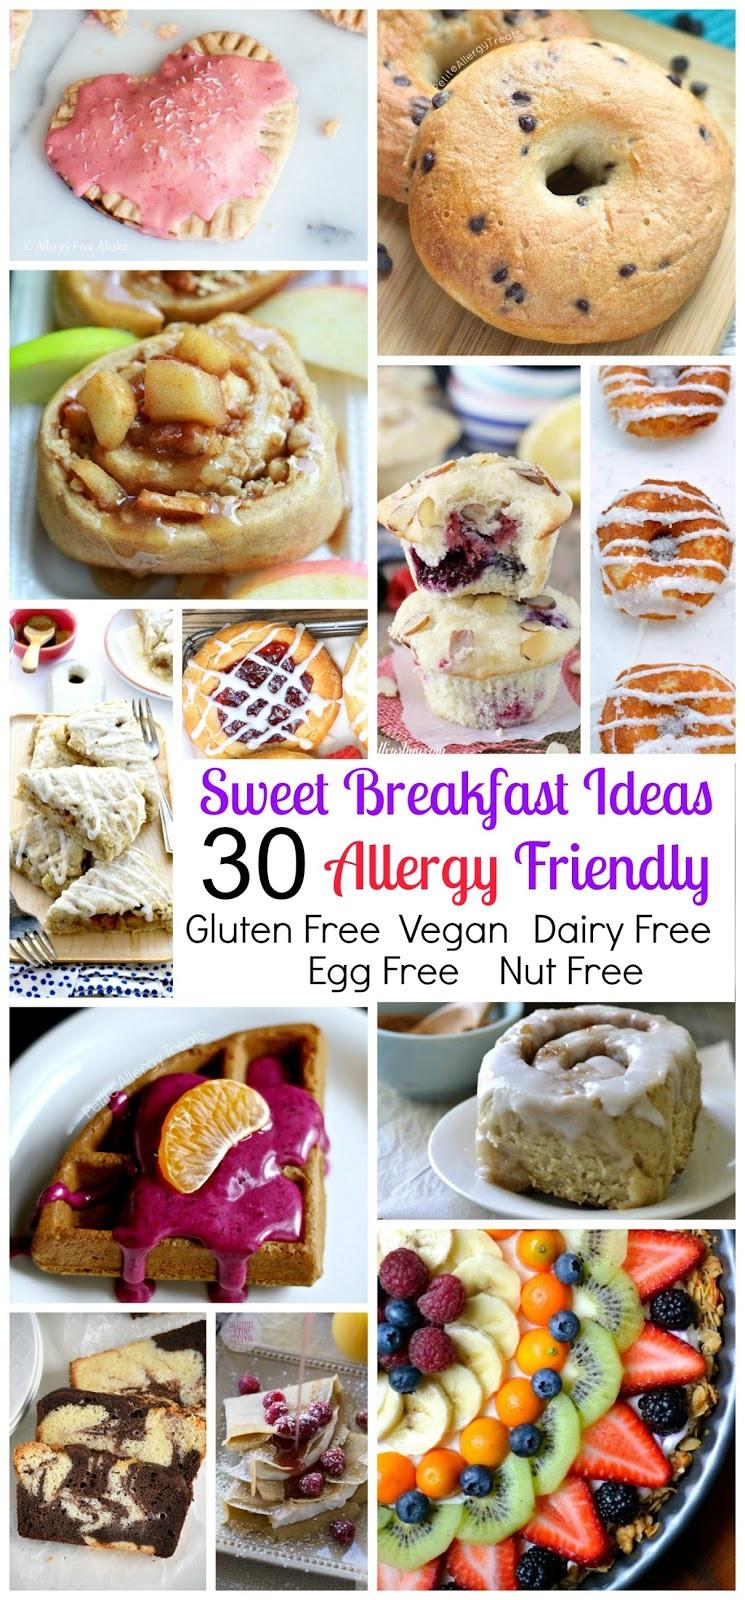 Gluten Free Dairy Free Egg Free Recipes Breakfast  Allergy Friendly Gluten Free Sweet Breakfast Treat Round